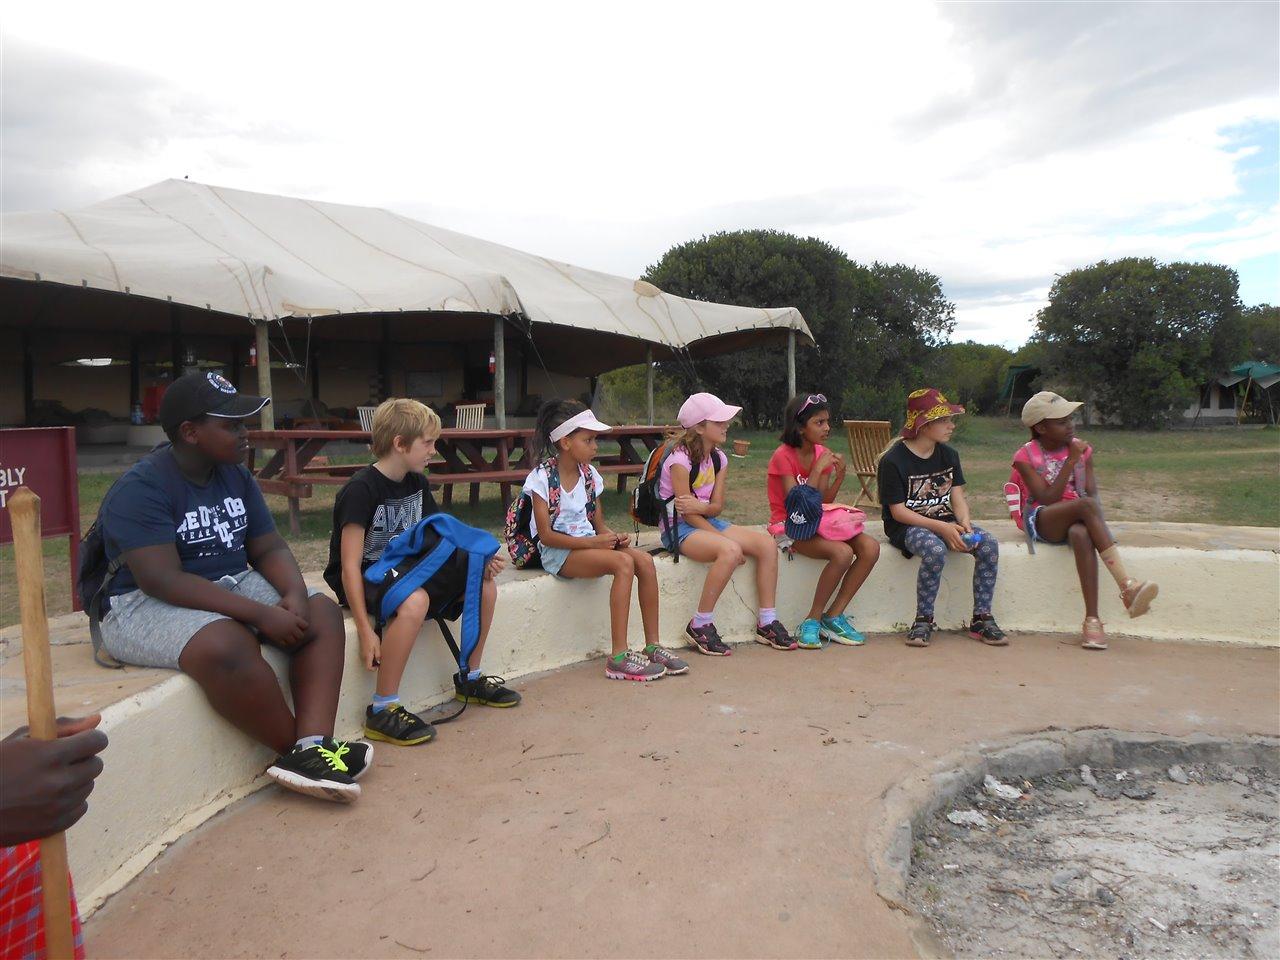 OI Pejeta Kenya